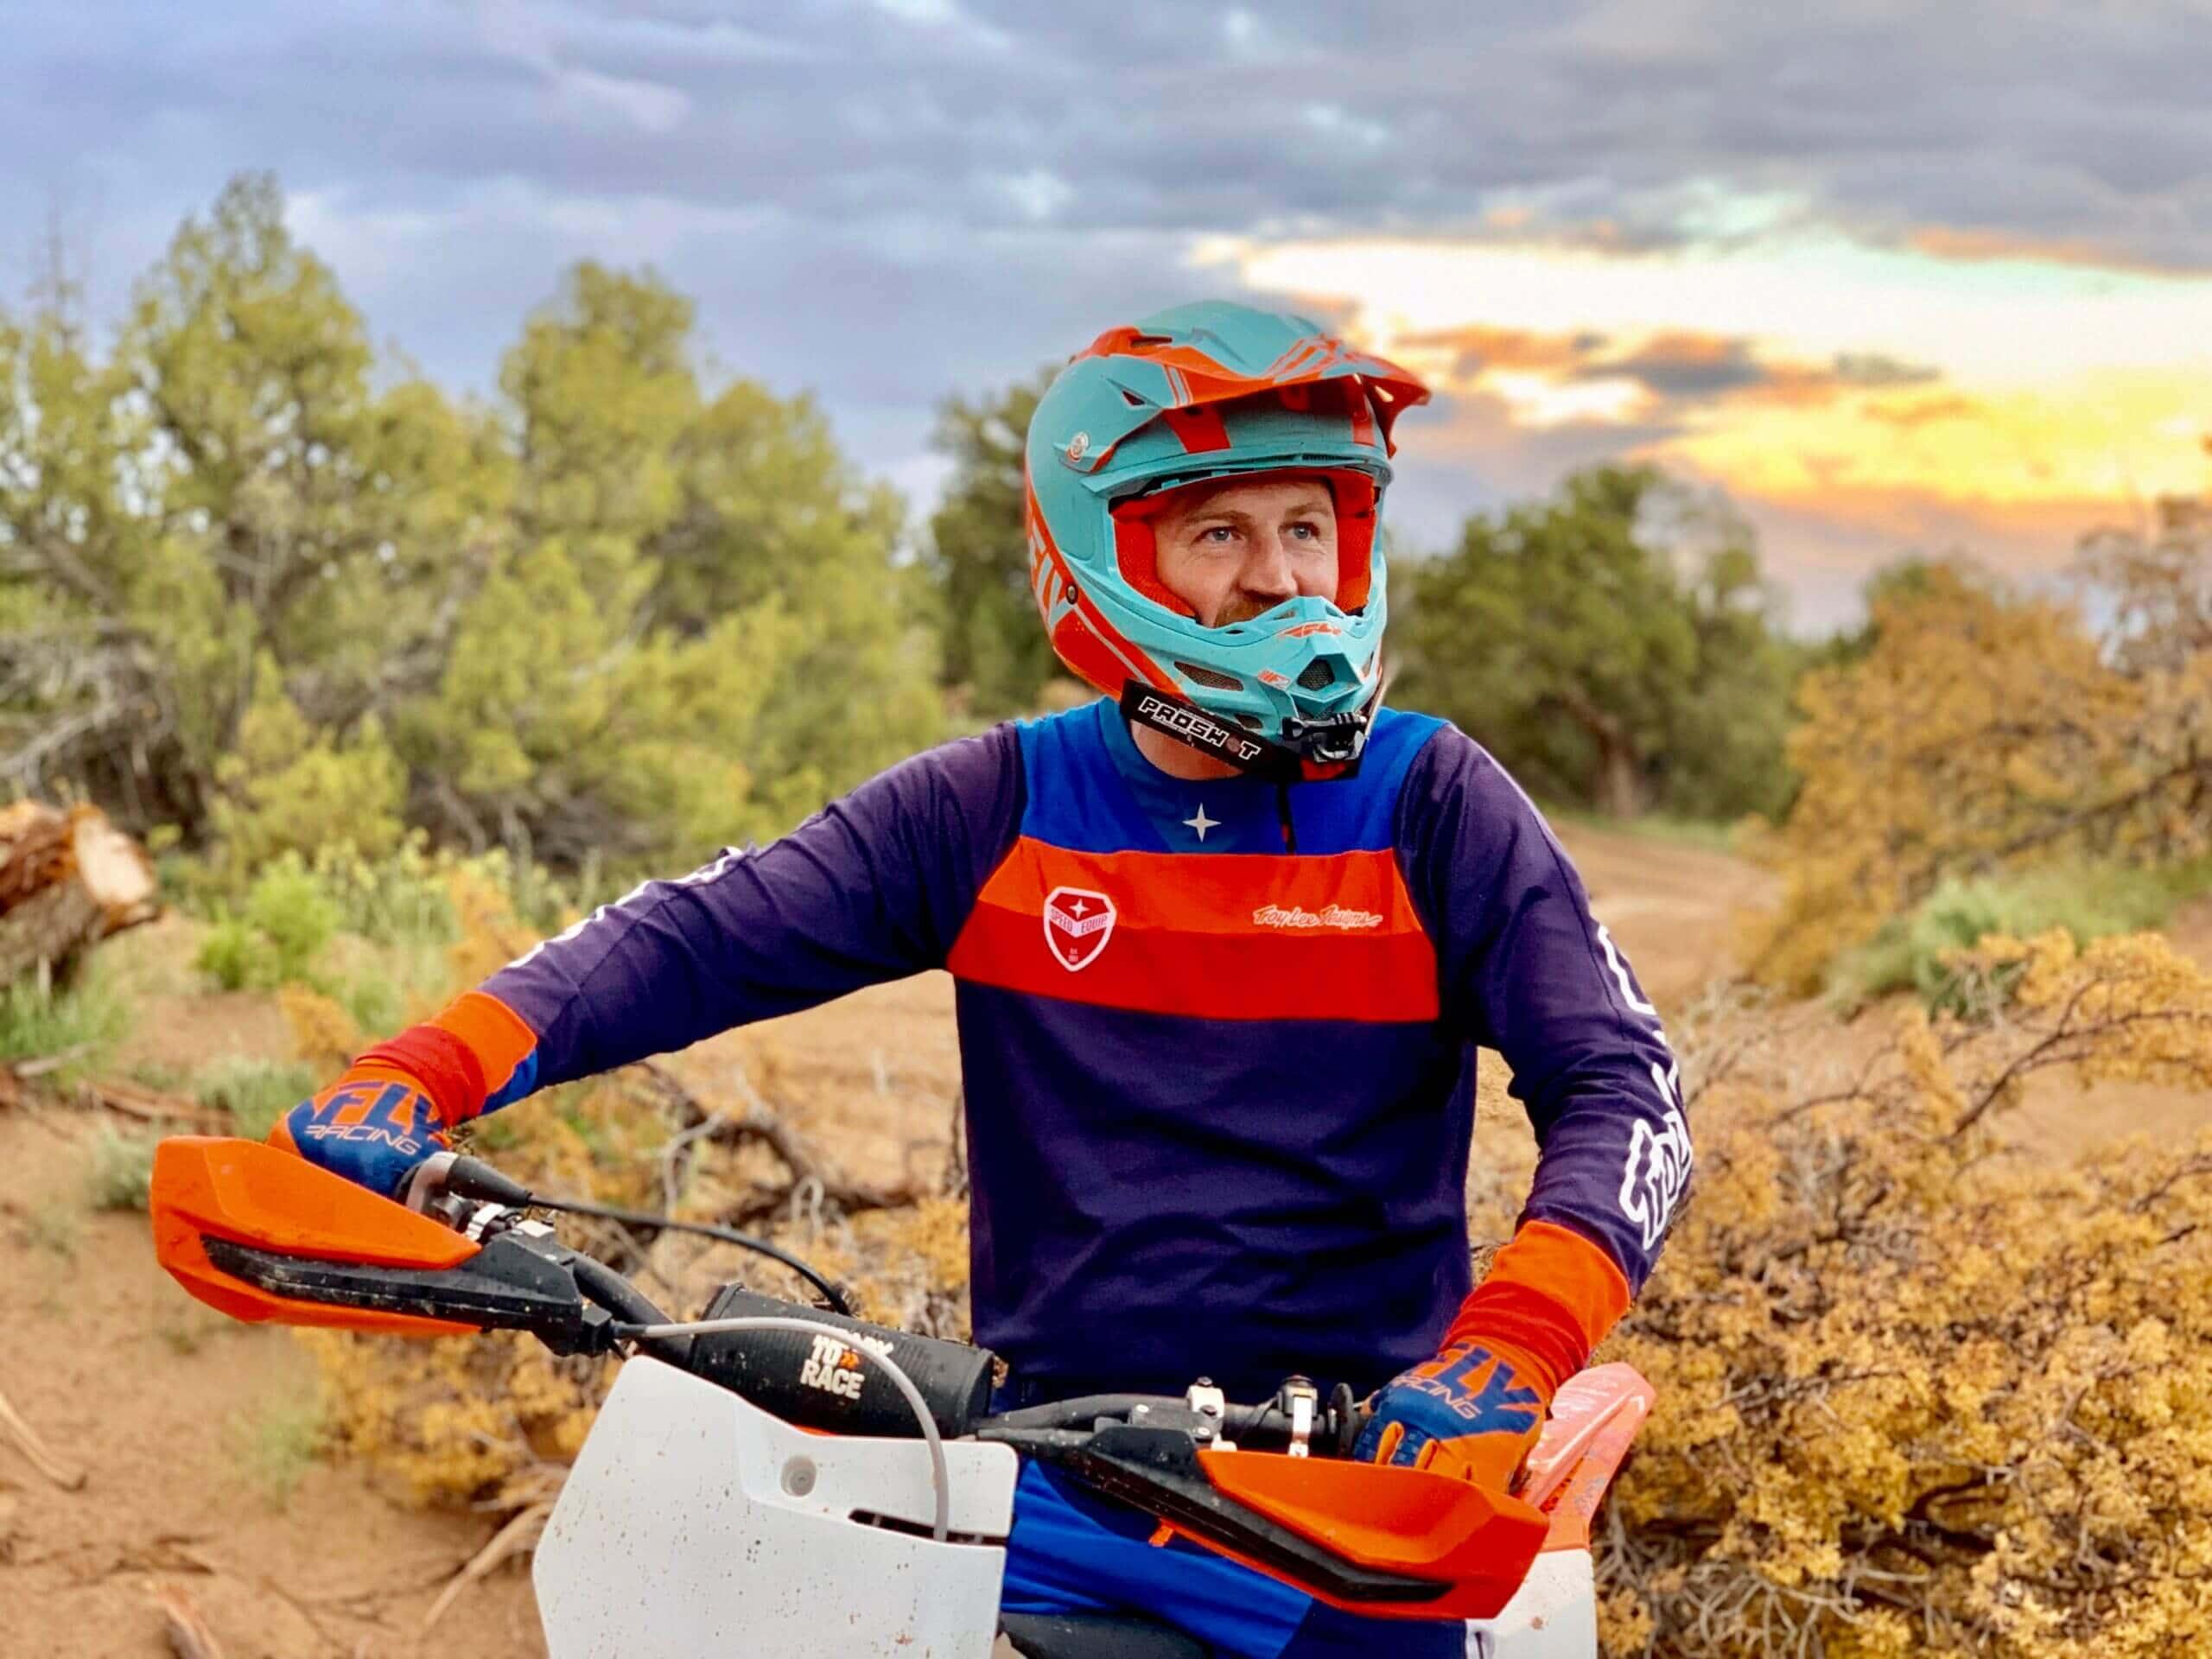 Sam Oldham from Dirtbike Sam on his dirt bike